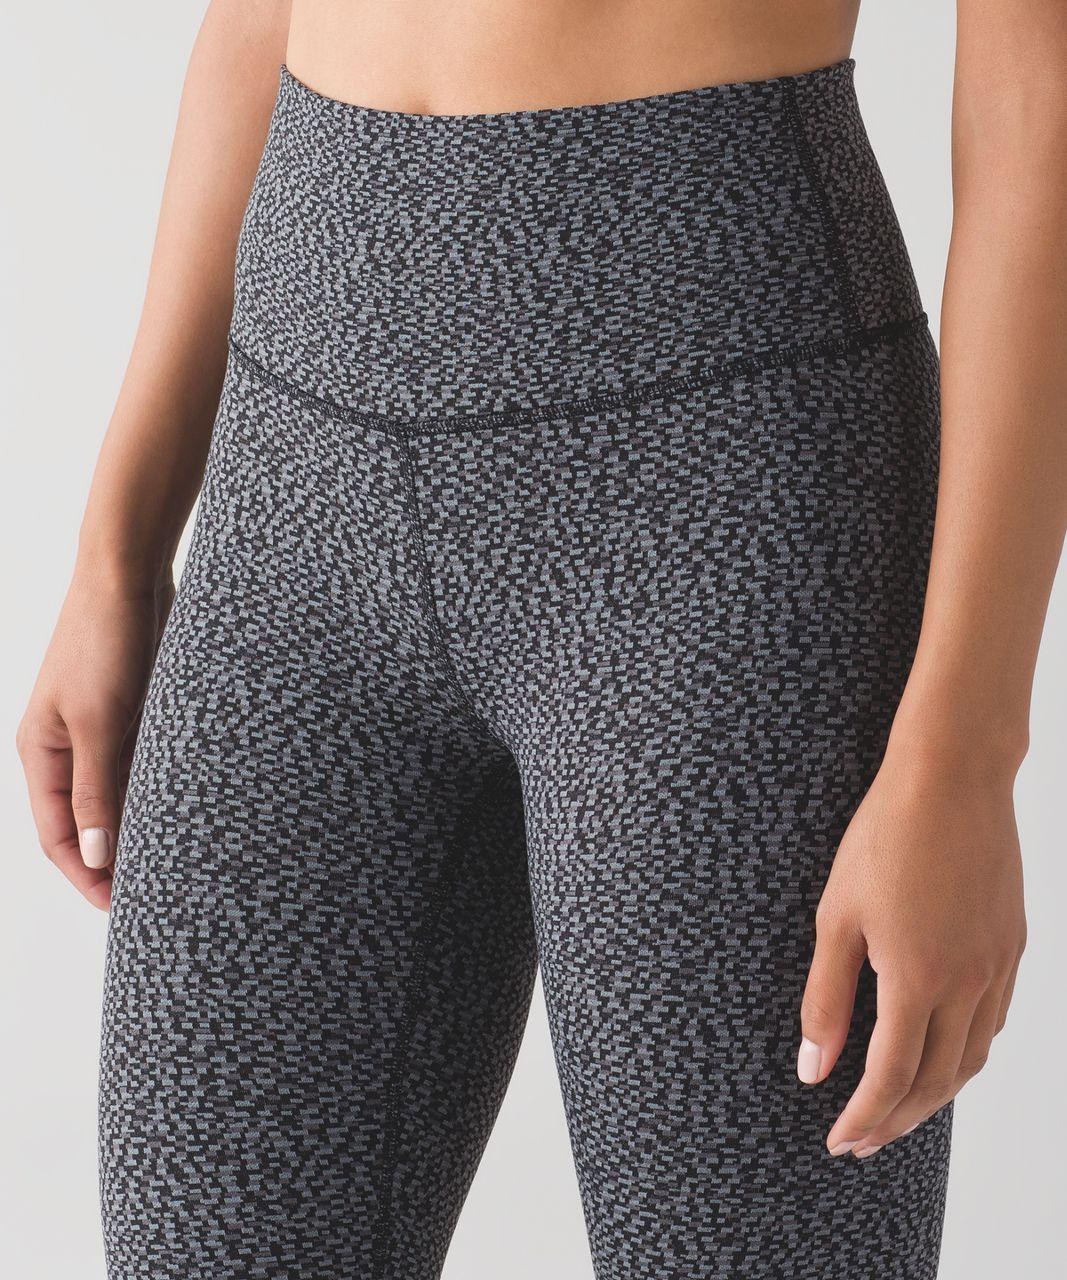 Lululemon High Times Pant - Digi Pixie Black Pitch Grey